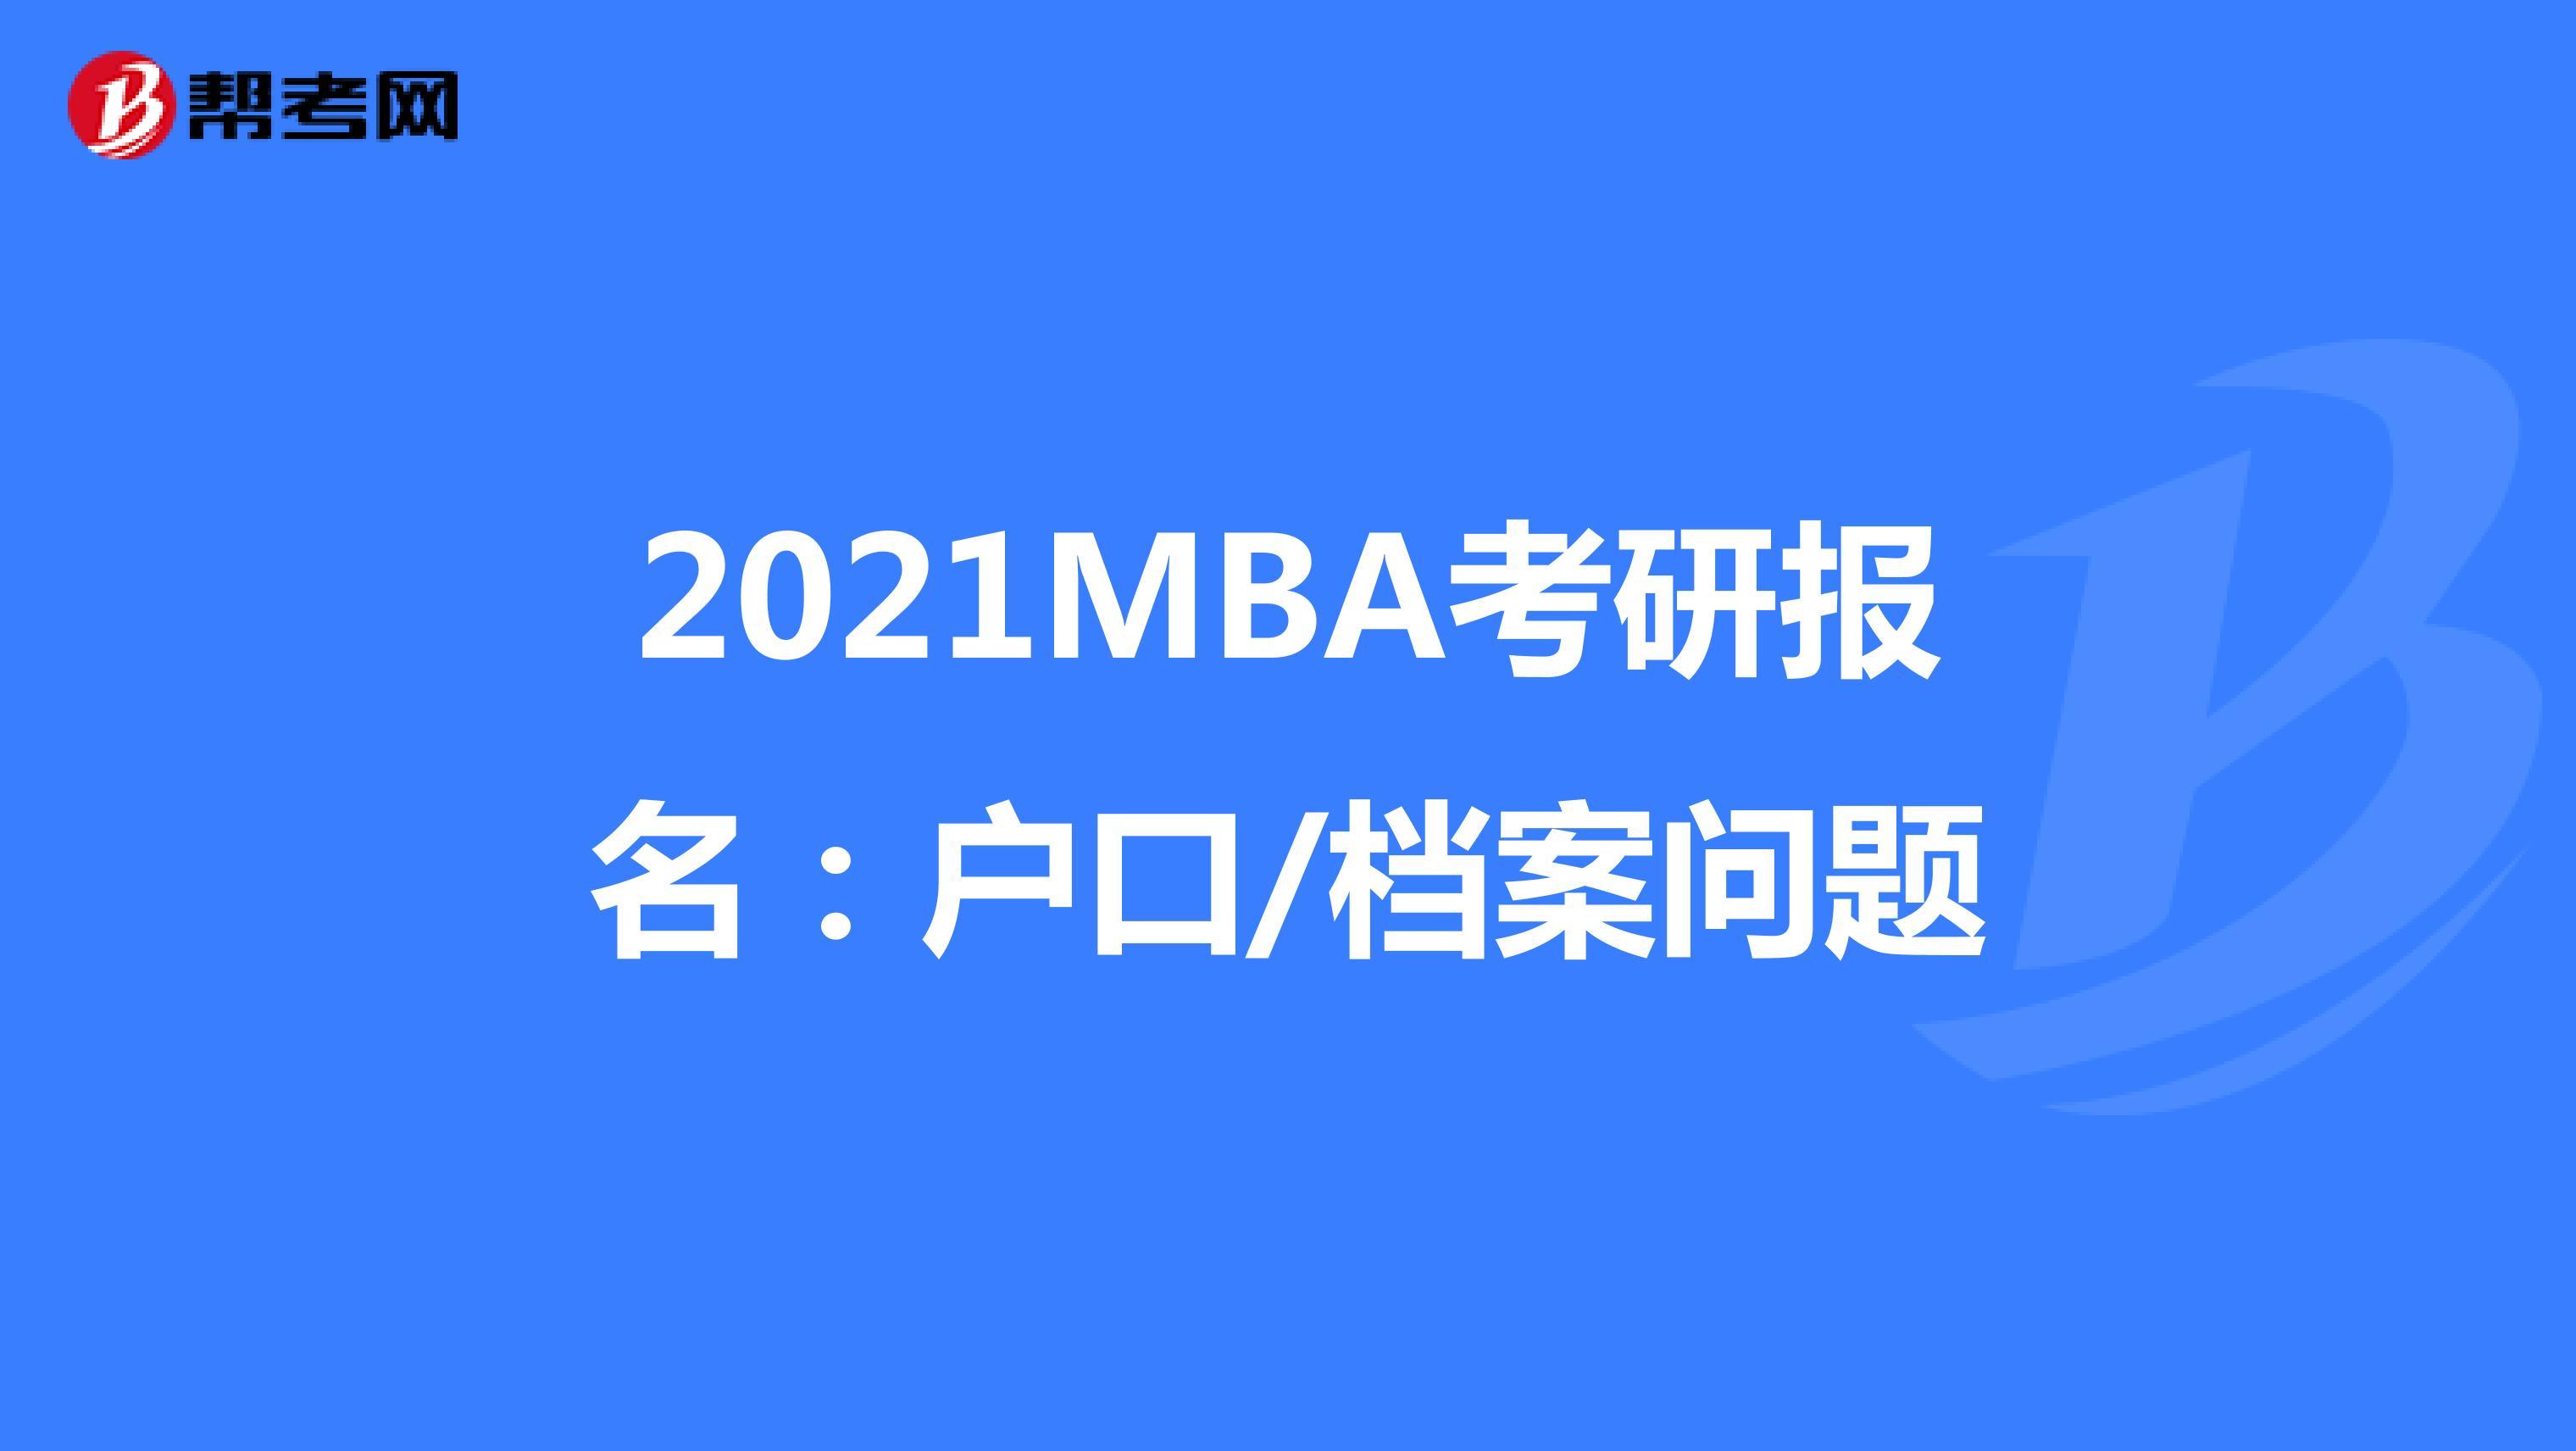 2021MBA考研报名:户口/档案问题